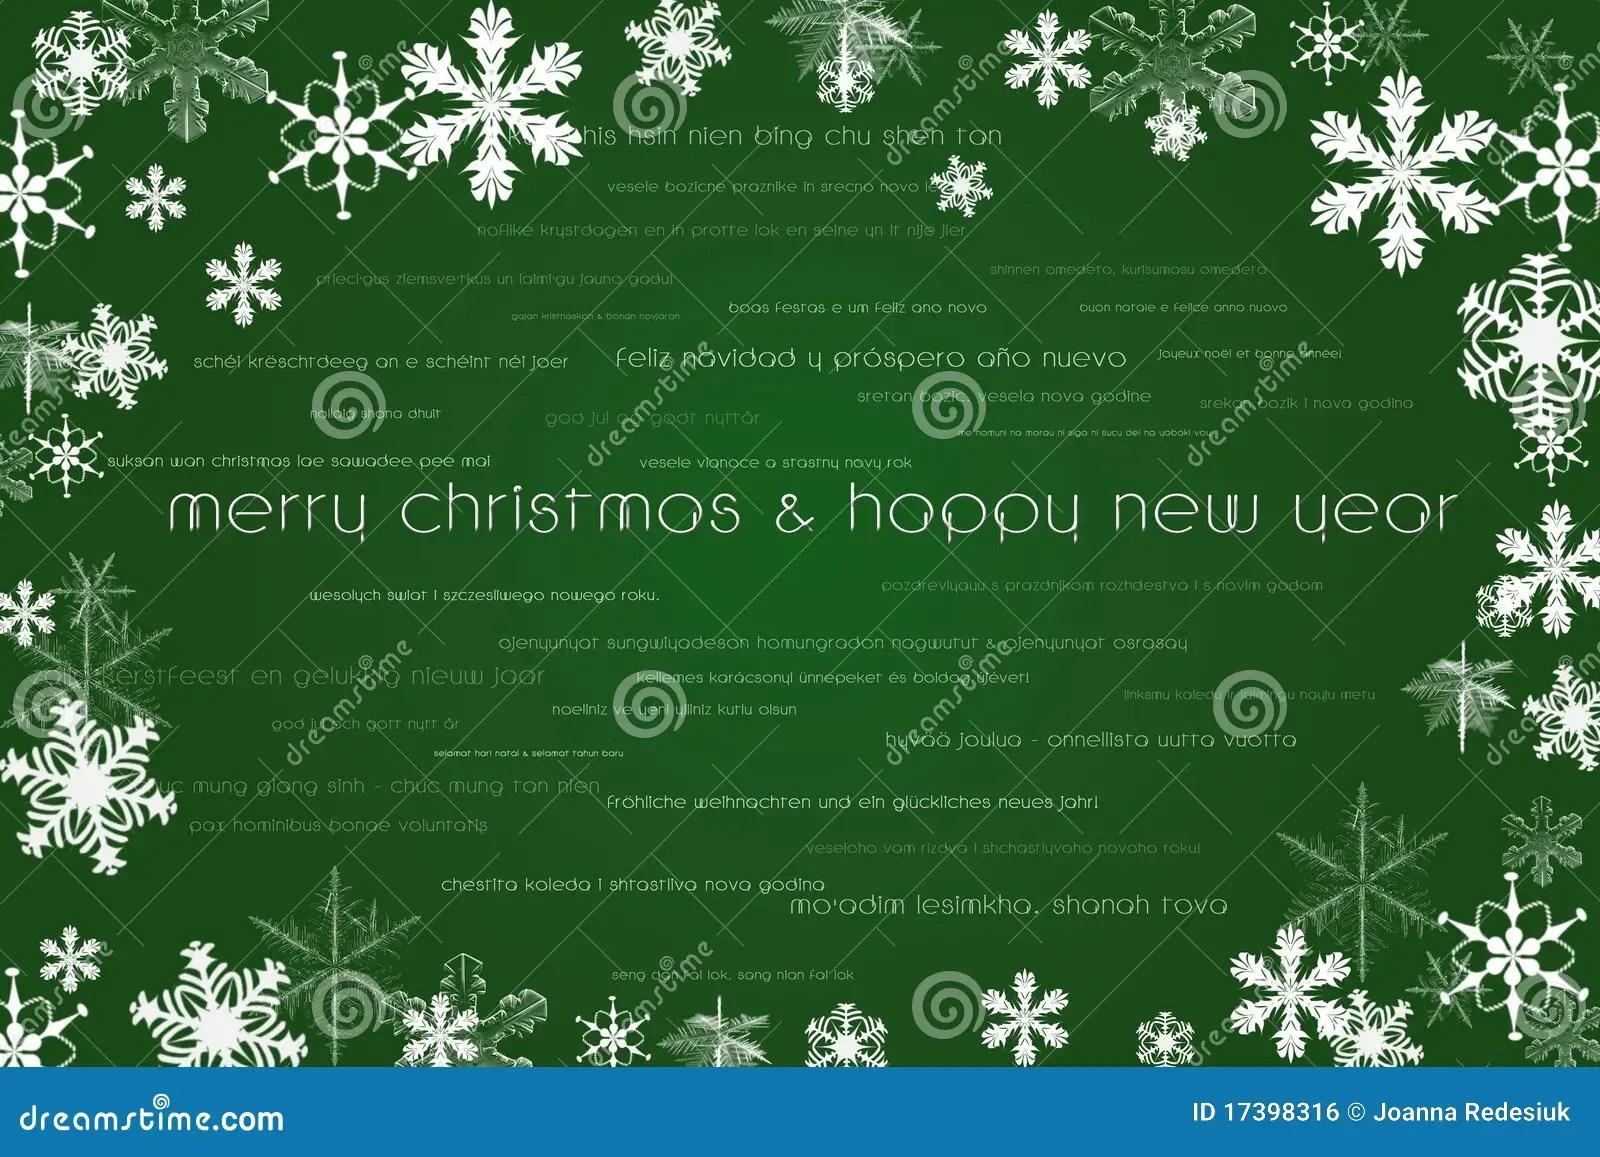 Translate Italian To Merry Christmas